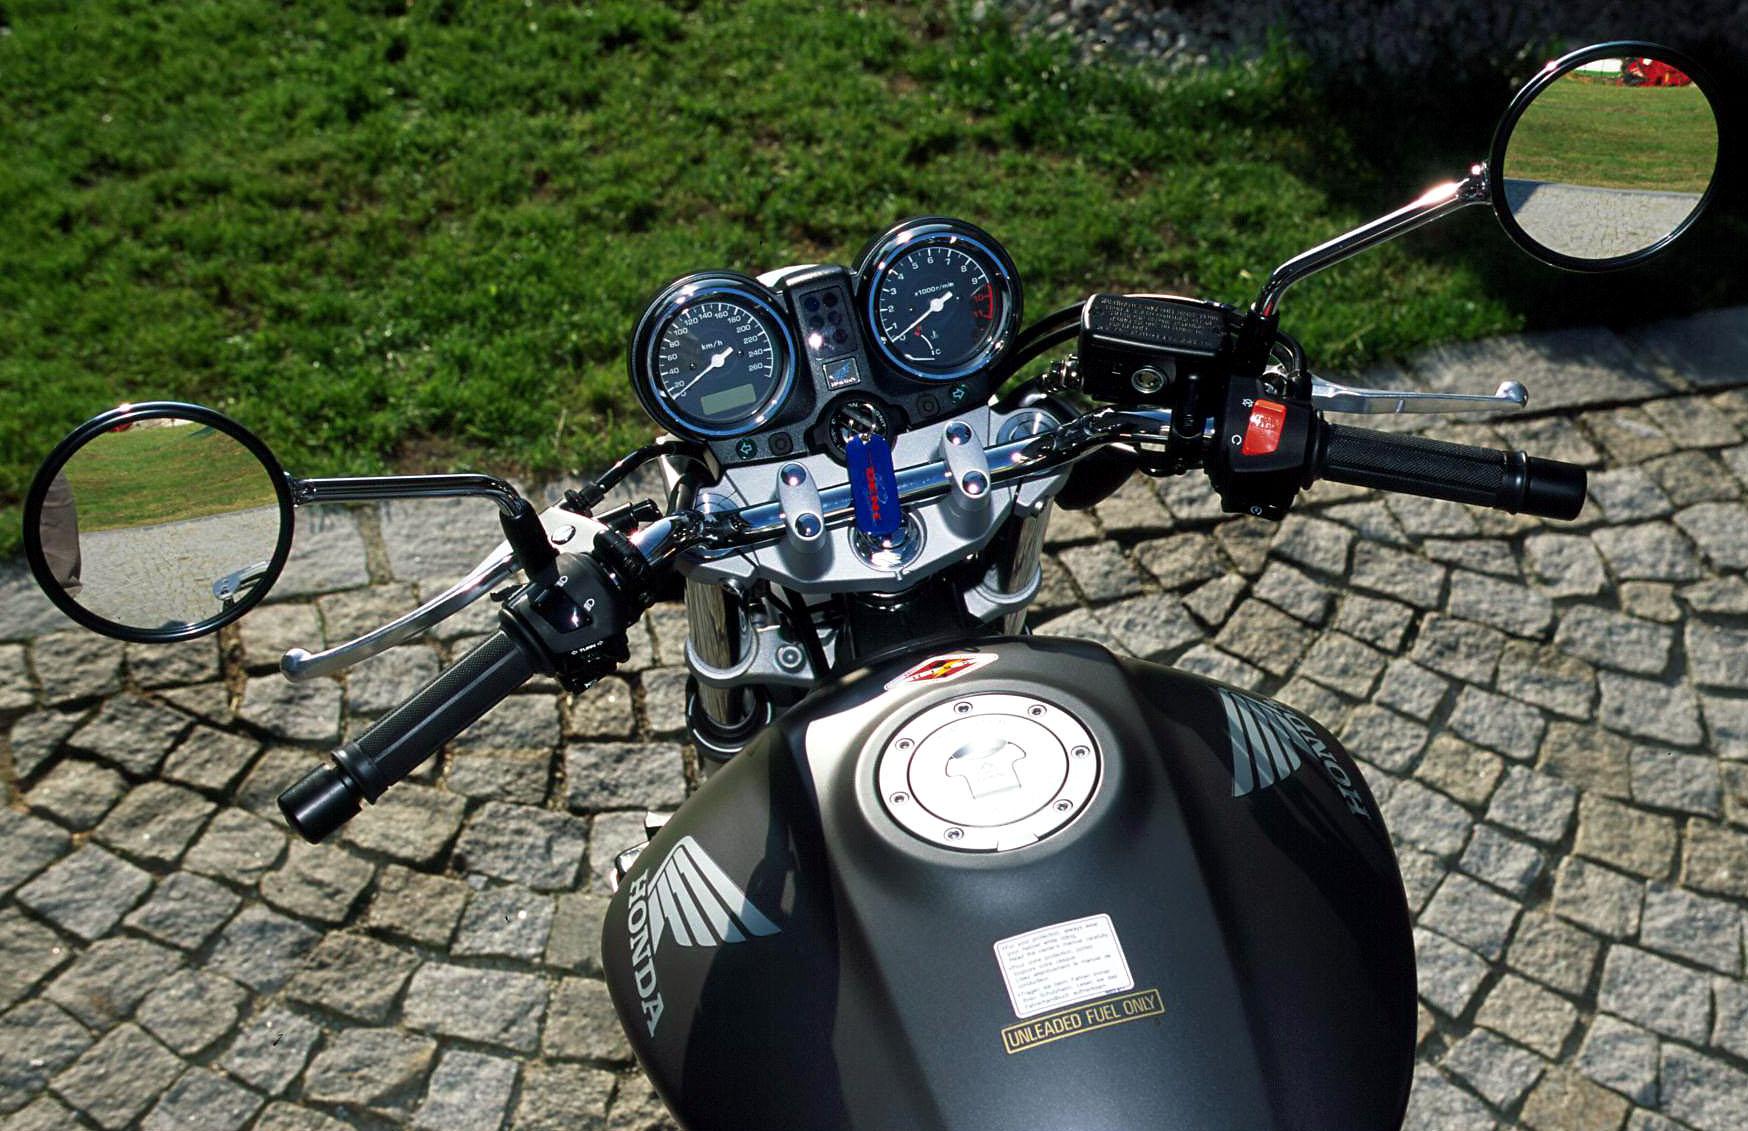 honda 600 hornet 2010 au salon de la moto de lyon 2010 car interior design. Black Bedroom Furniture Sets. Home Design Ideas